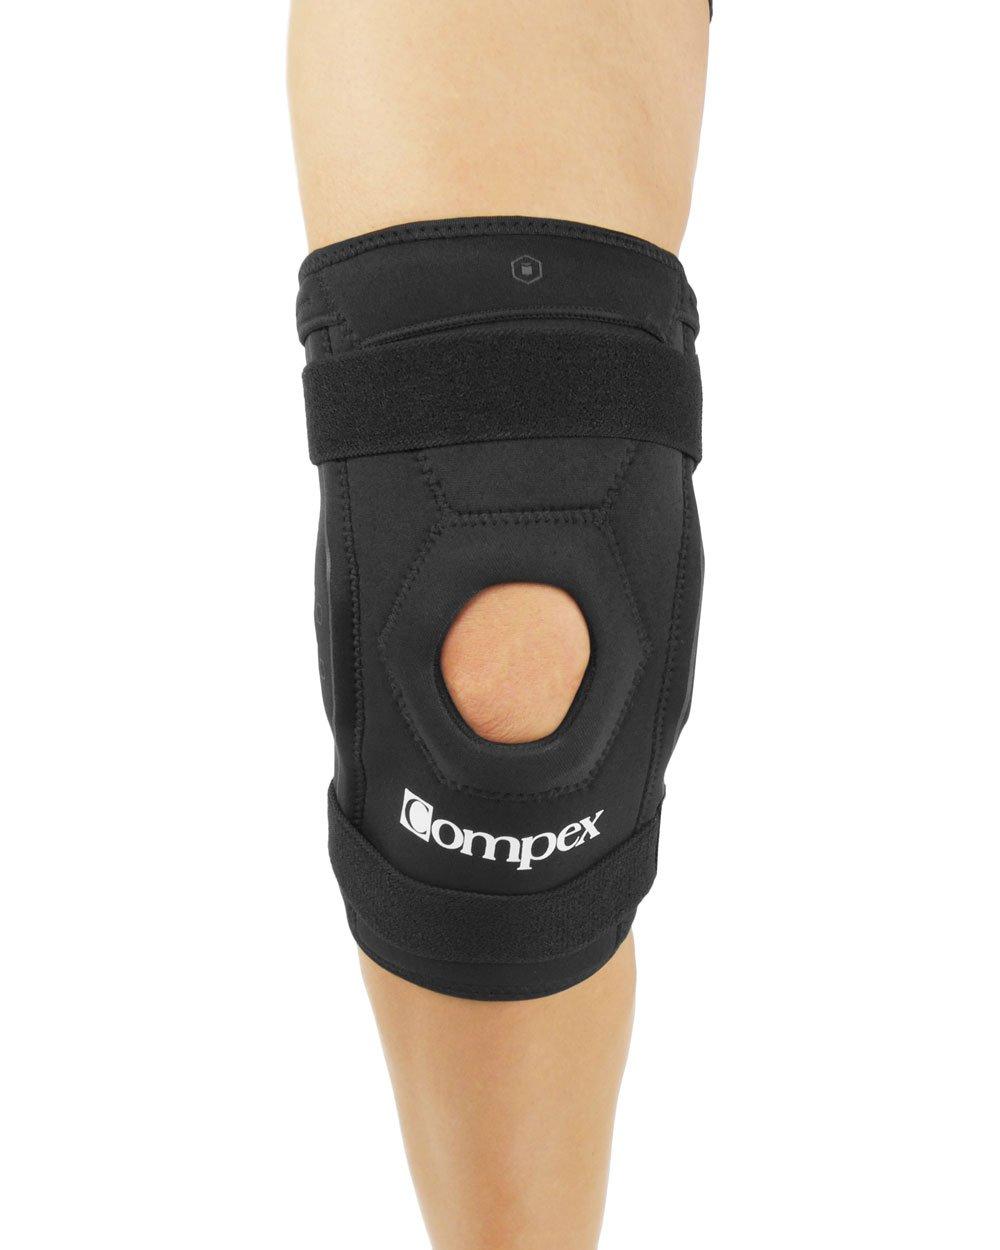 COMPEX Bionic orthèse de genou